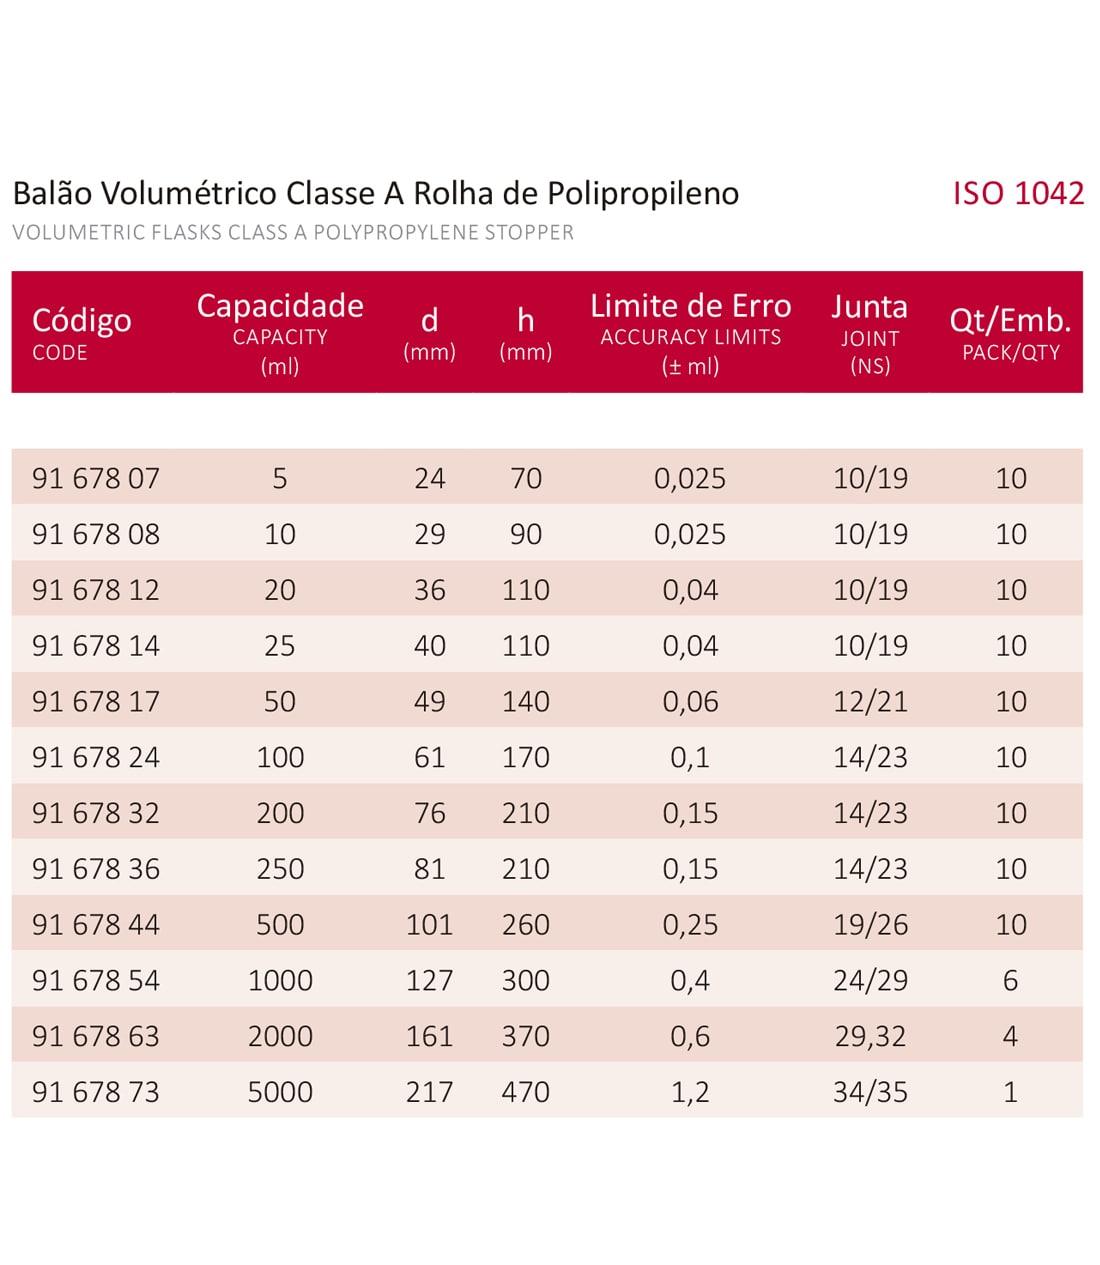 BALÃO VOLUMÉTRICO CLASSE A ROLHA POLI C/ CERTIFICADO  RBC 1 ML - Marca Laborglas - Cód. 9167801-R